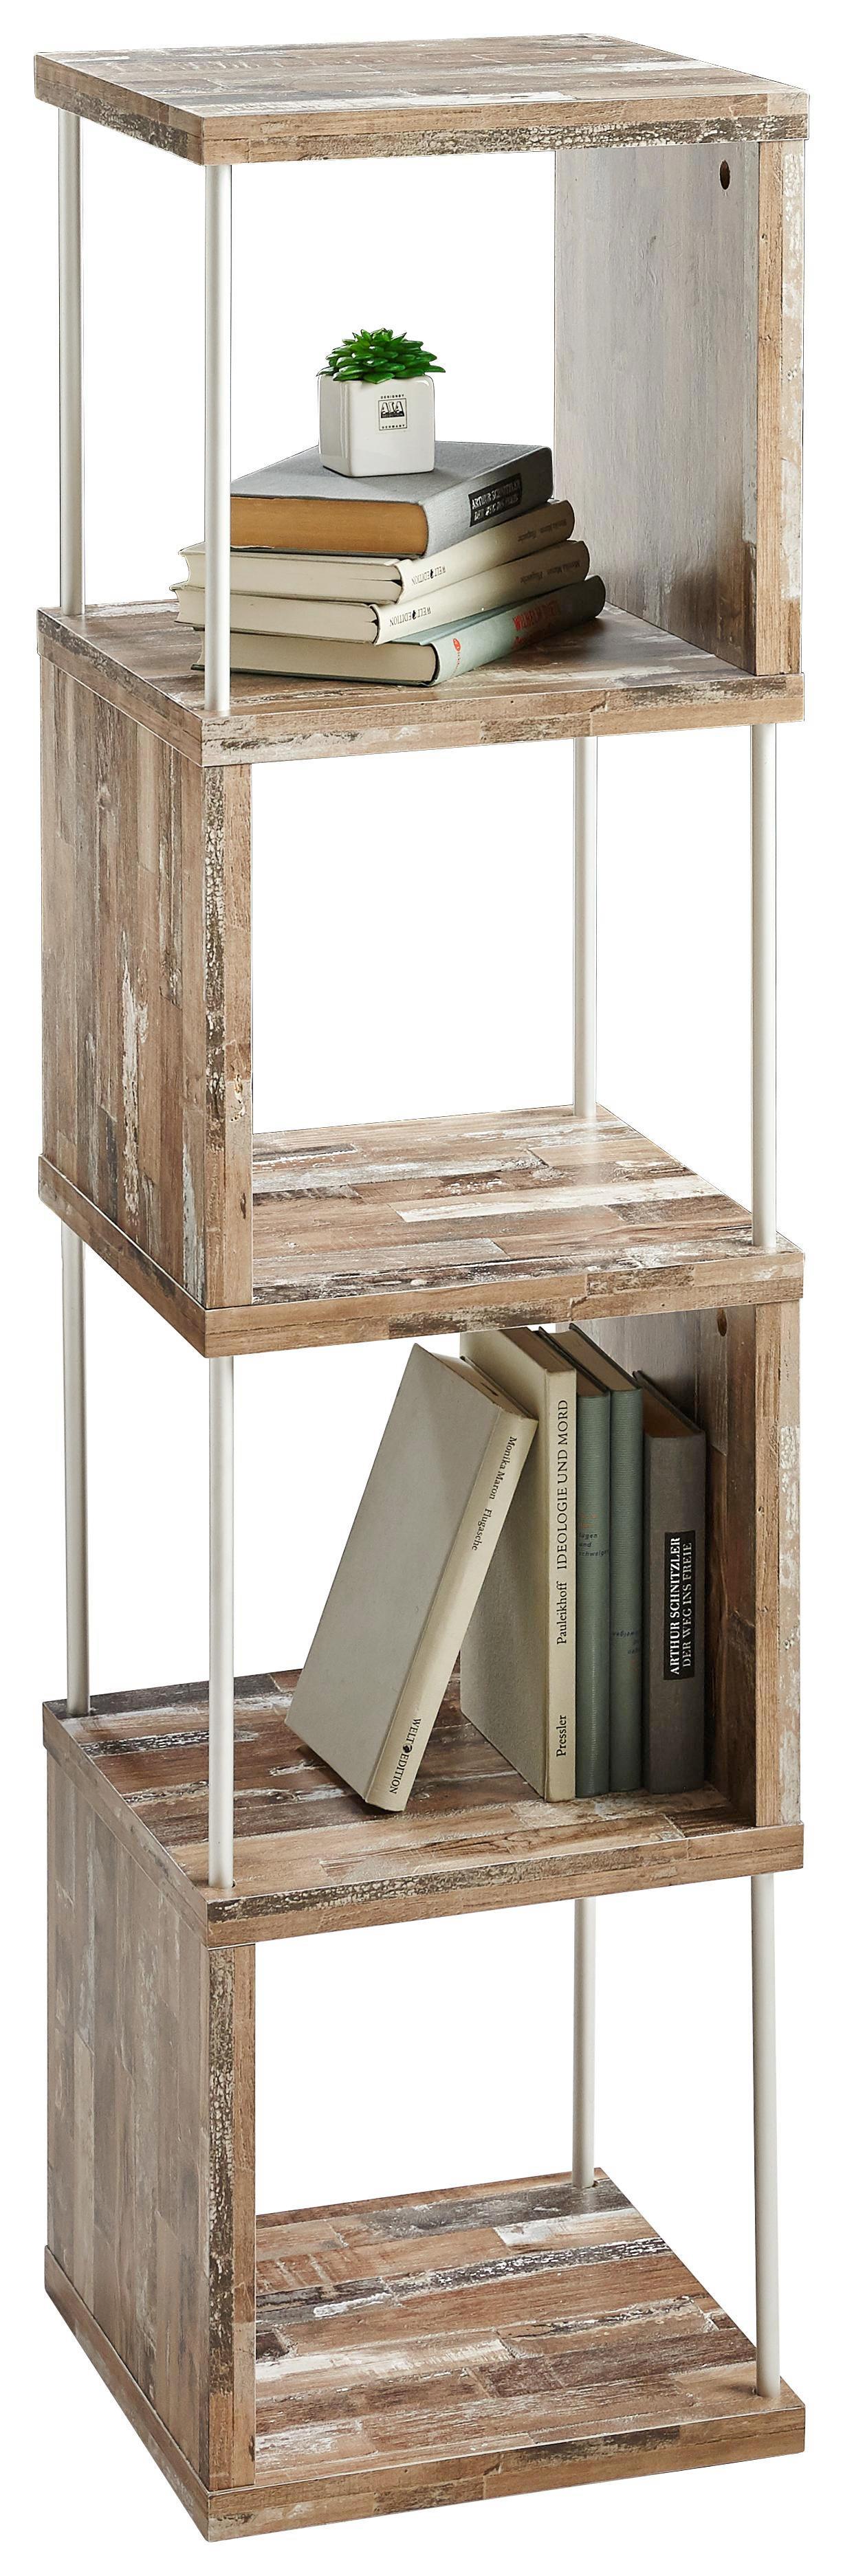 REGAL Braun - Braun, Design, Metall (33/125,8/33cm) - XORA